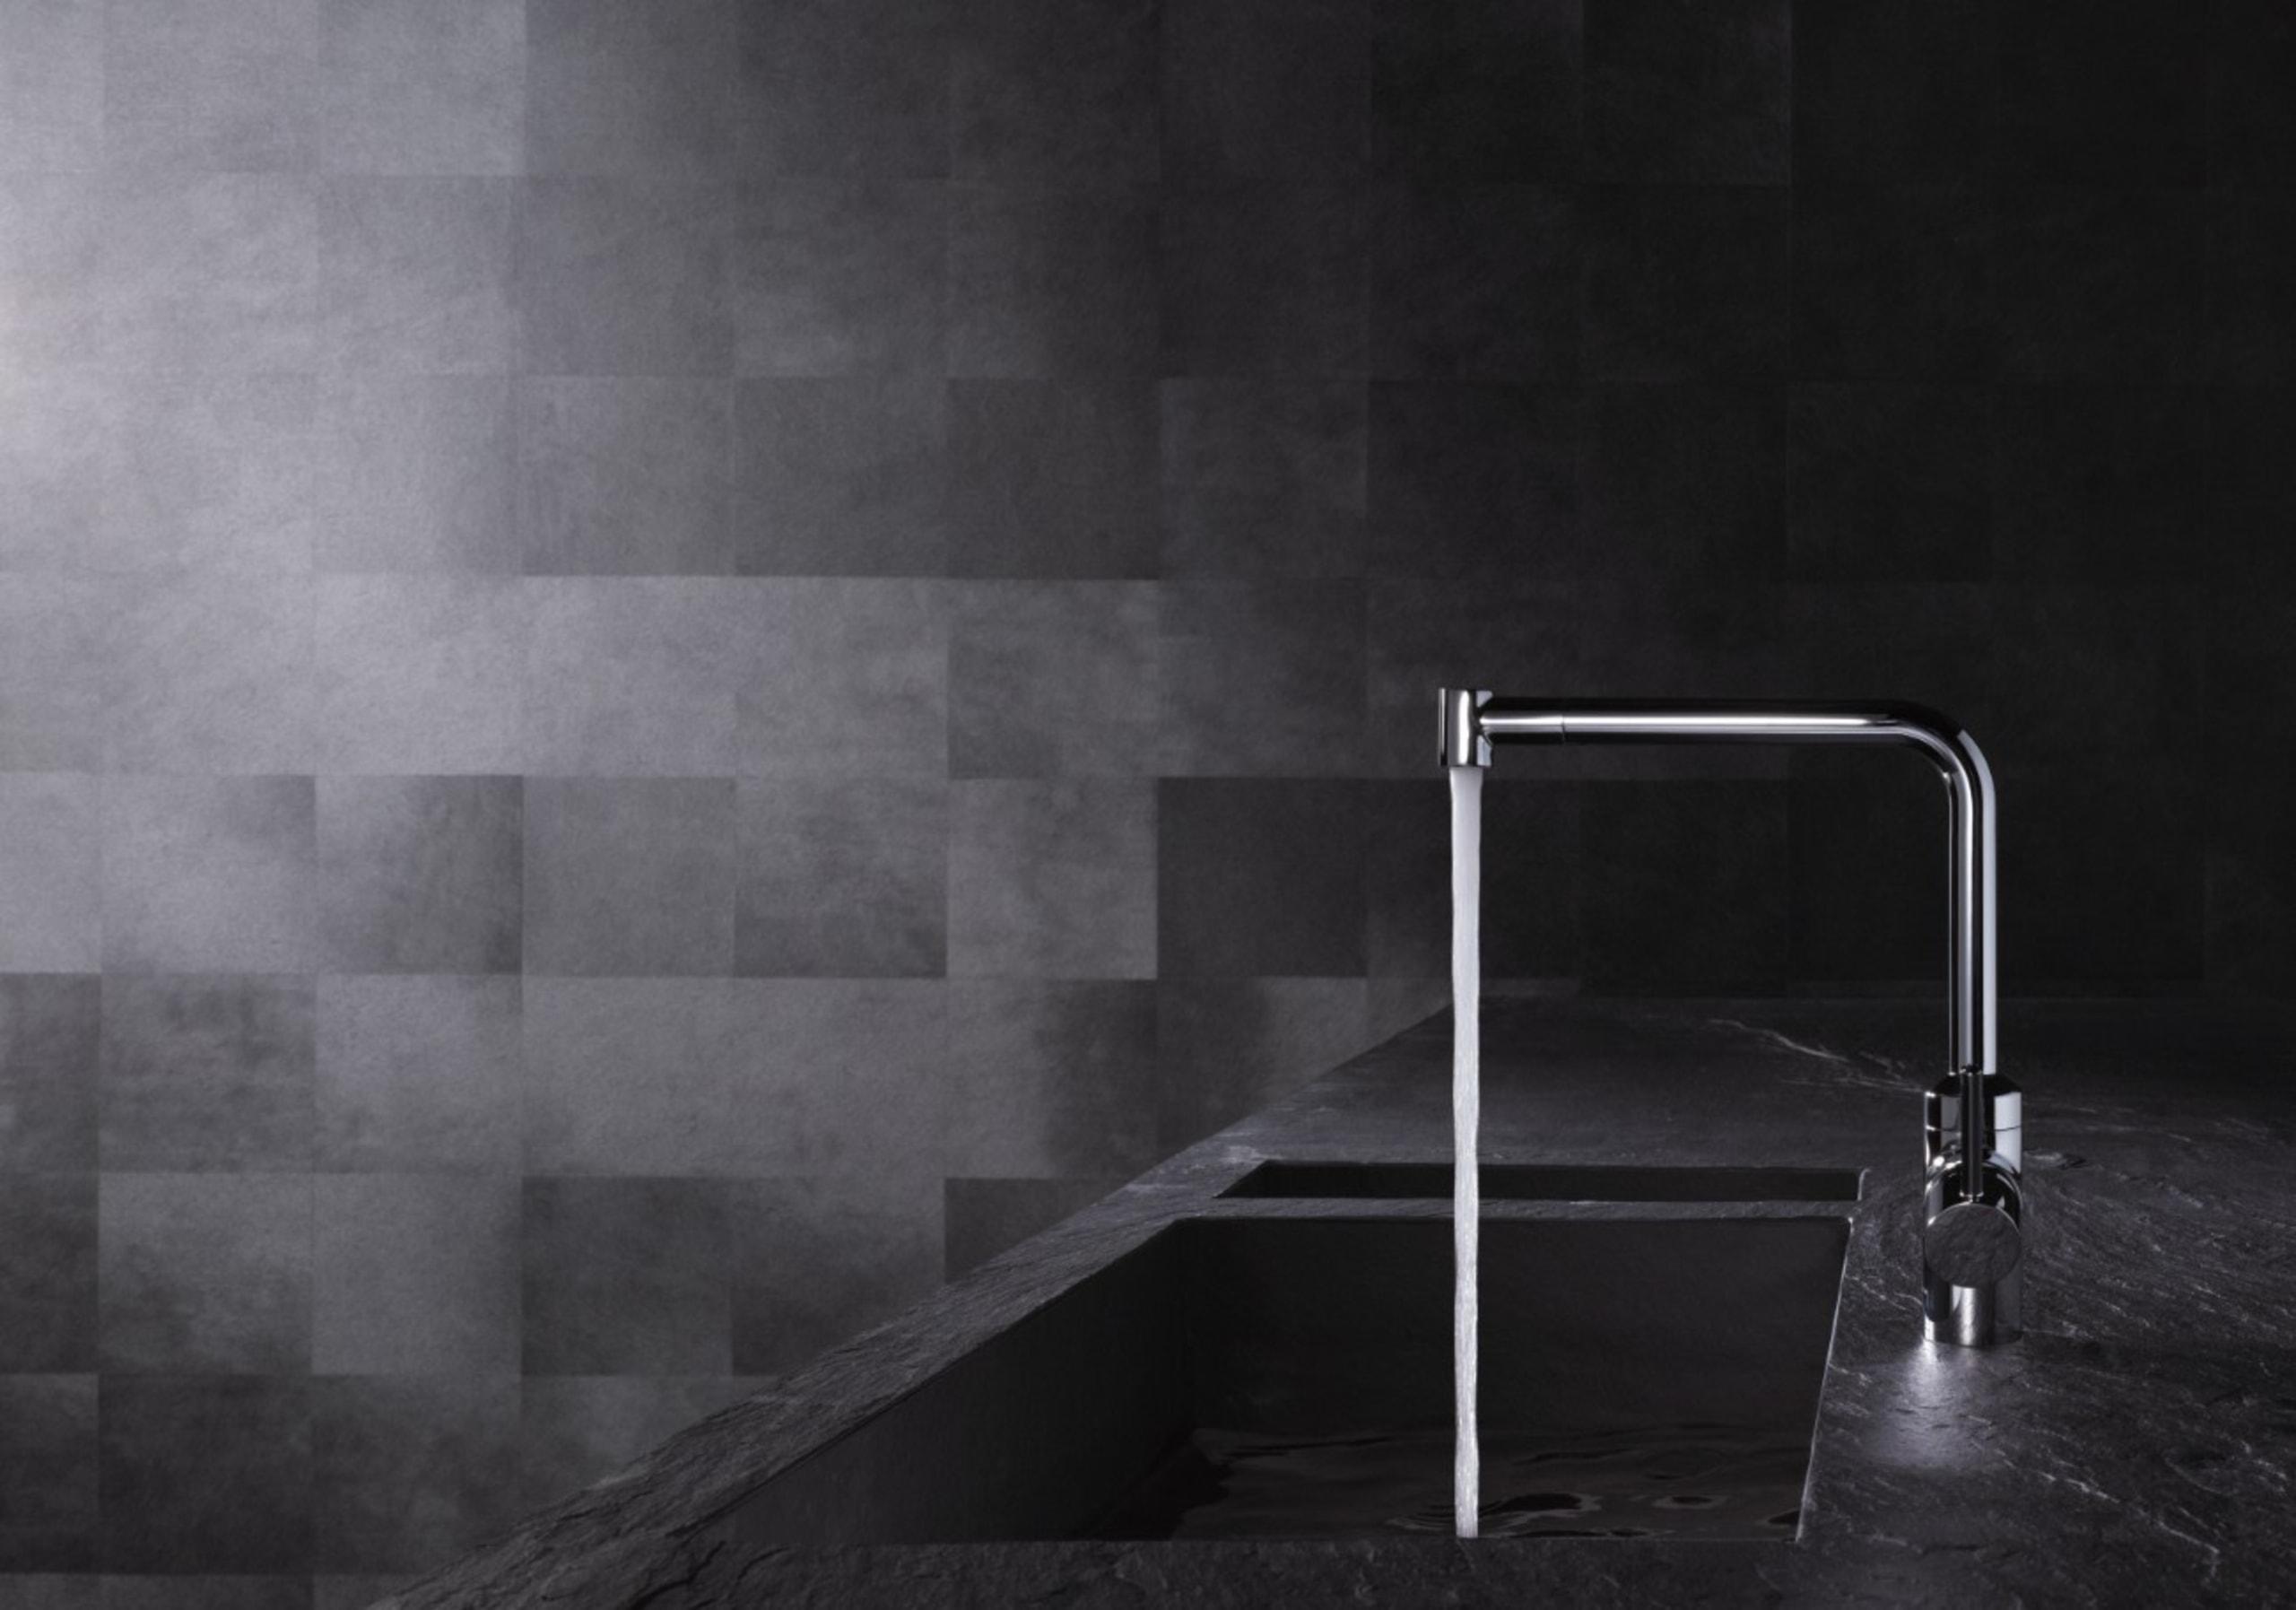 KLUDI L-INE 04 - KLUDI L-INE 04 - angle, architecture, black, black and white, floor, flooring, light, lighting, monochrome, monochrome photography, phenomenon, still life photography, tap, wall, black, gray